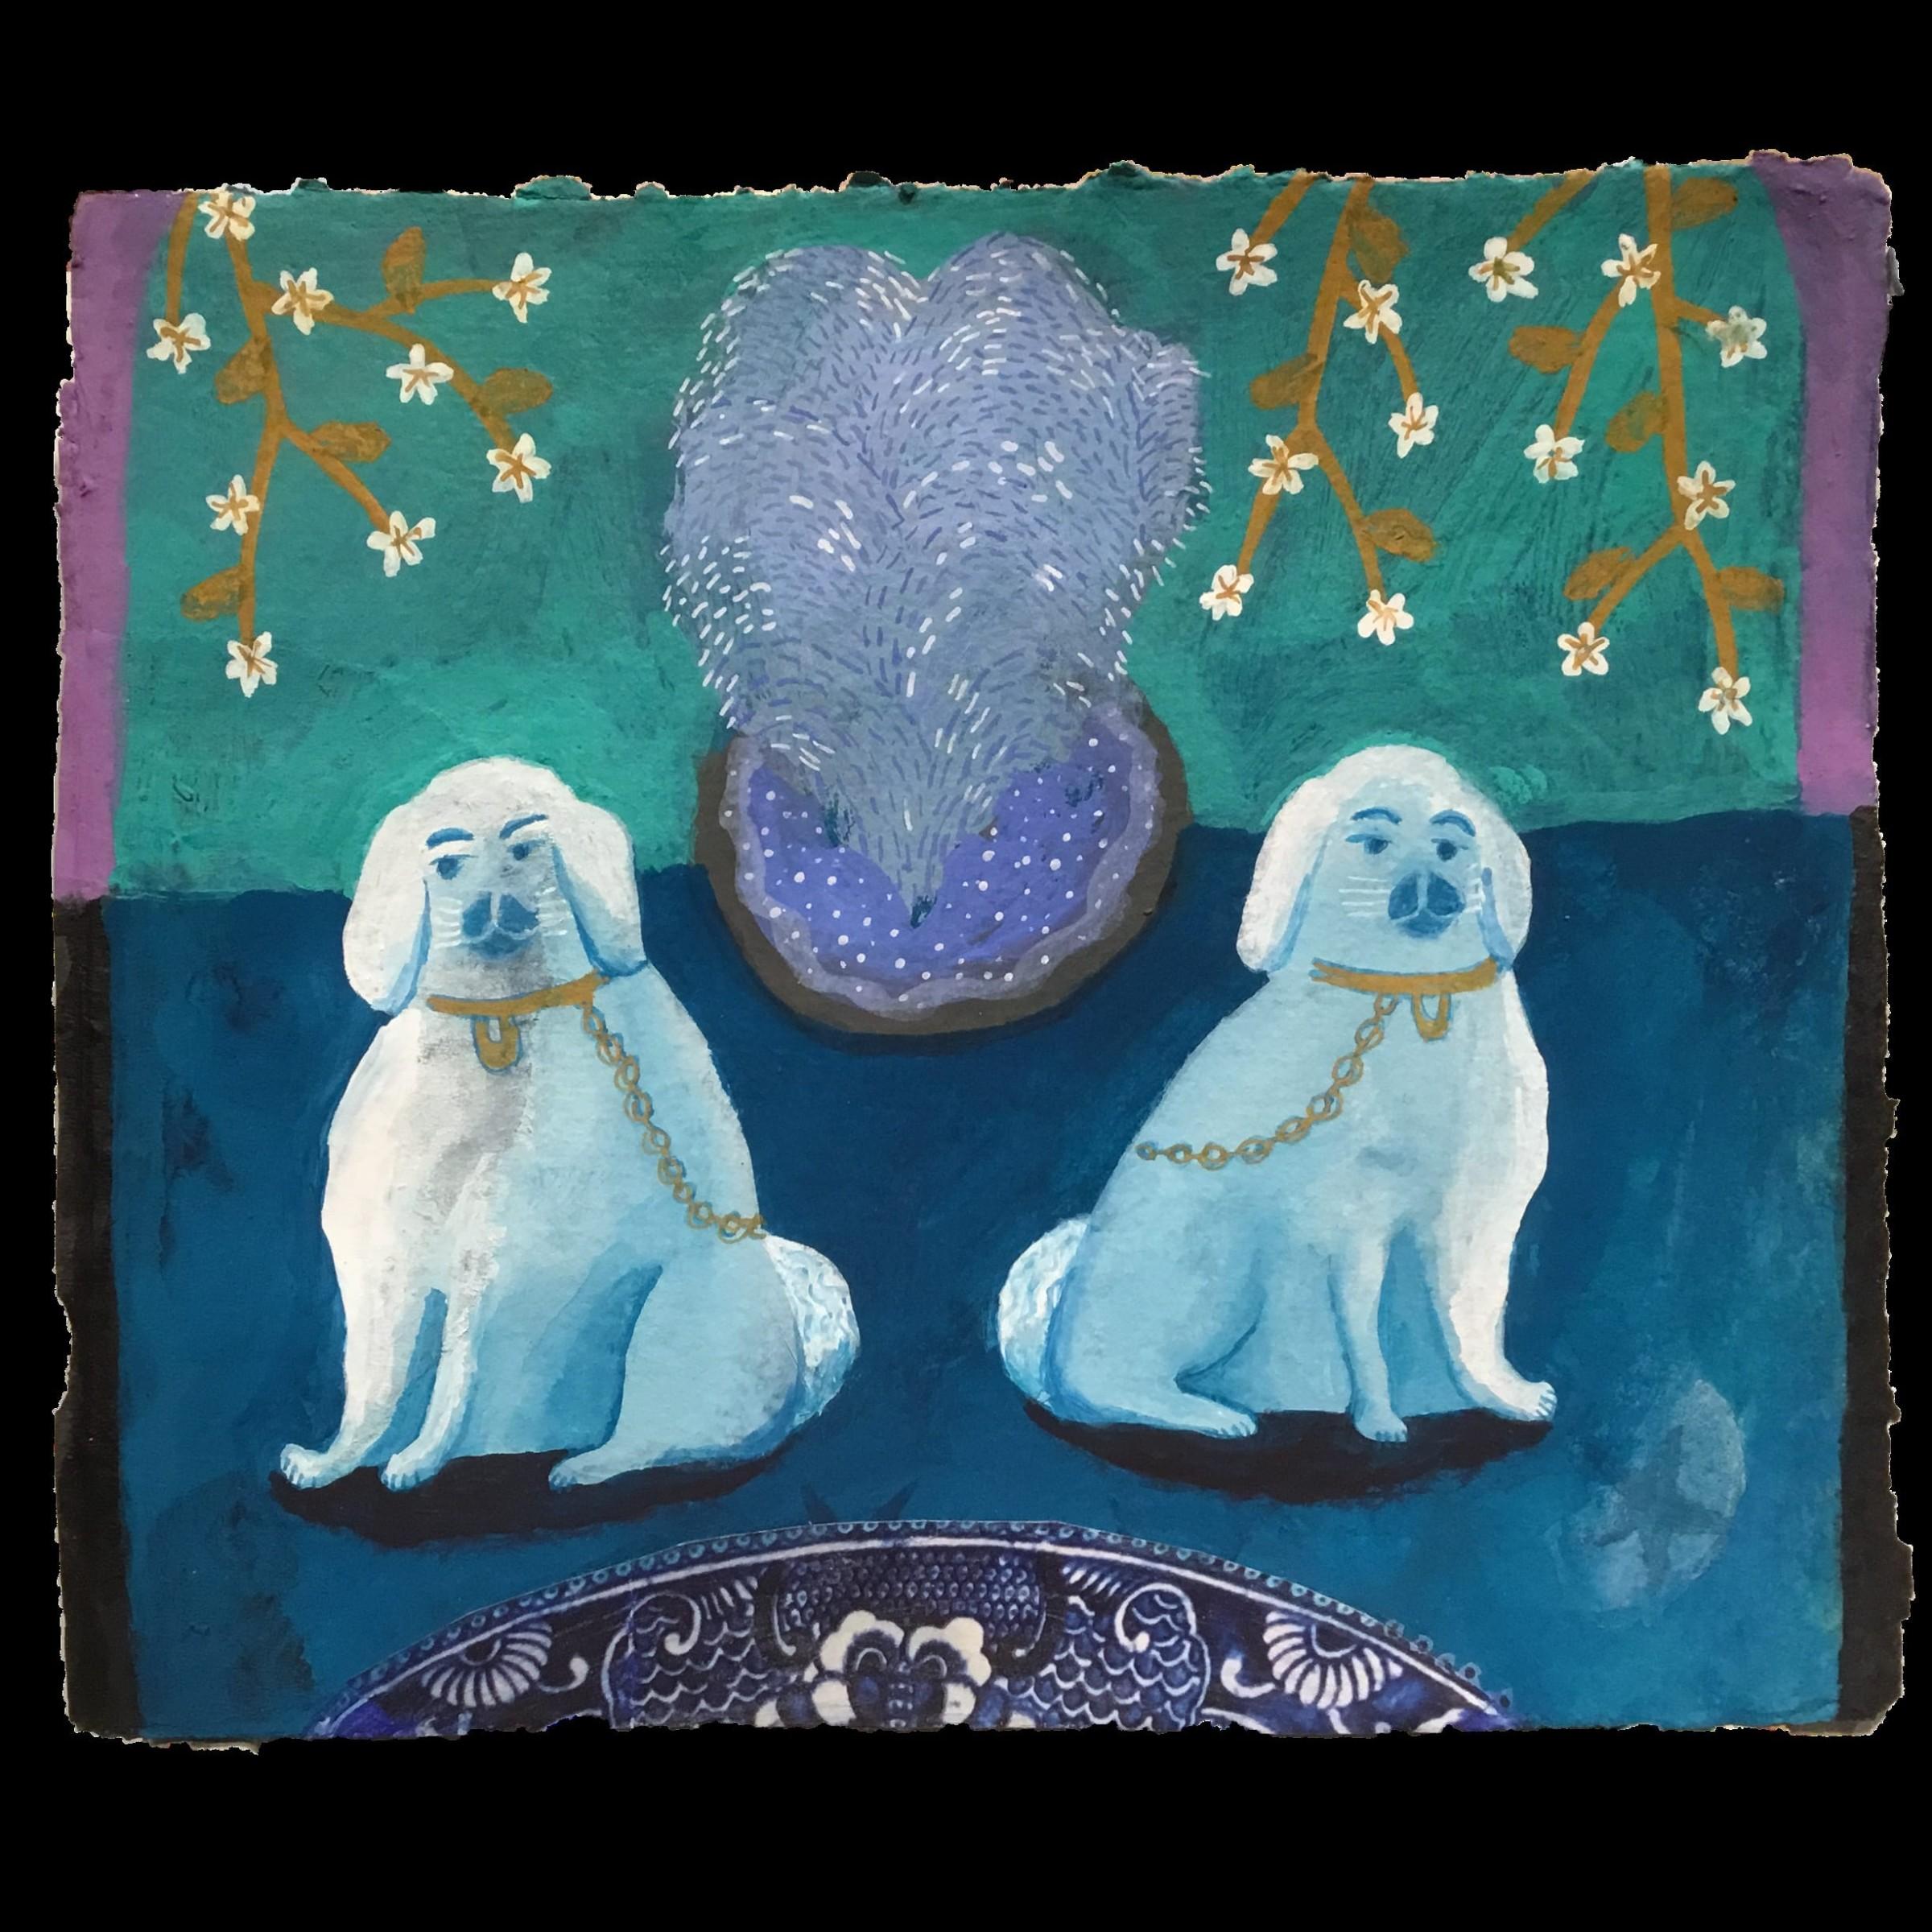 "<span class=""link fancybox-details-link""><a href=""/artists/146-gertie-young/works/11671-gertie-young-blue-dogs-with-fountain/"">View Detail Page</a></span><div class=""artist""><span class=""artist""><strong>Gertie Young</strong></span></div><div class=""title""><em>Blue Dogs with Fountain</em></div><div class=""medium"">watercolour, gouache & collage</div><div class=""dimensions"">Artwork: 19 x 23 cm<br /> Frame: 29 x 32 cm<br /> </div><div class=""price"">£360.00</div>"